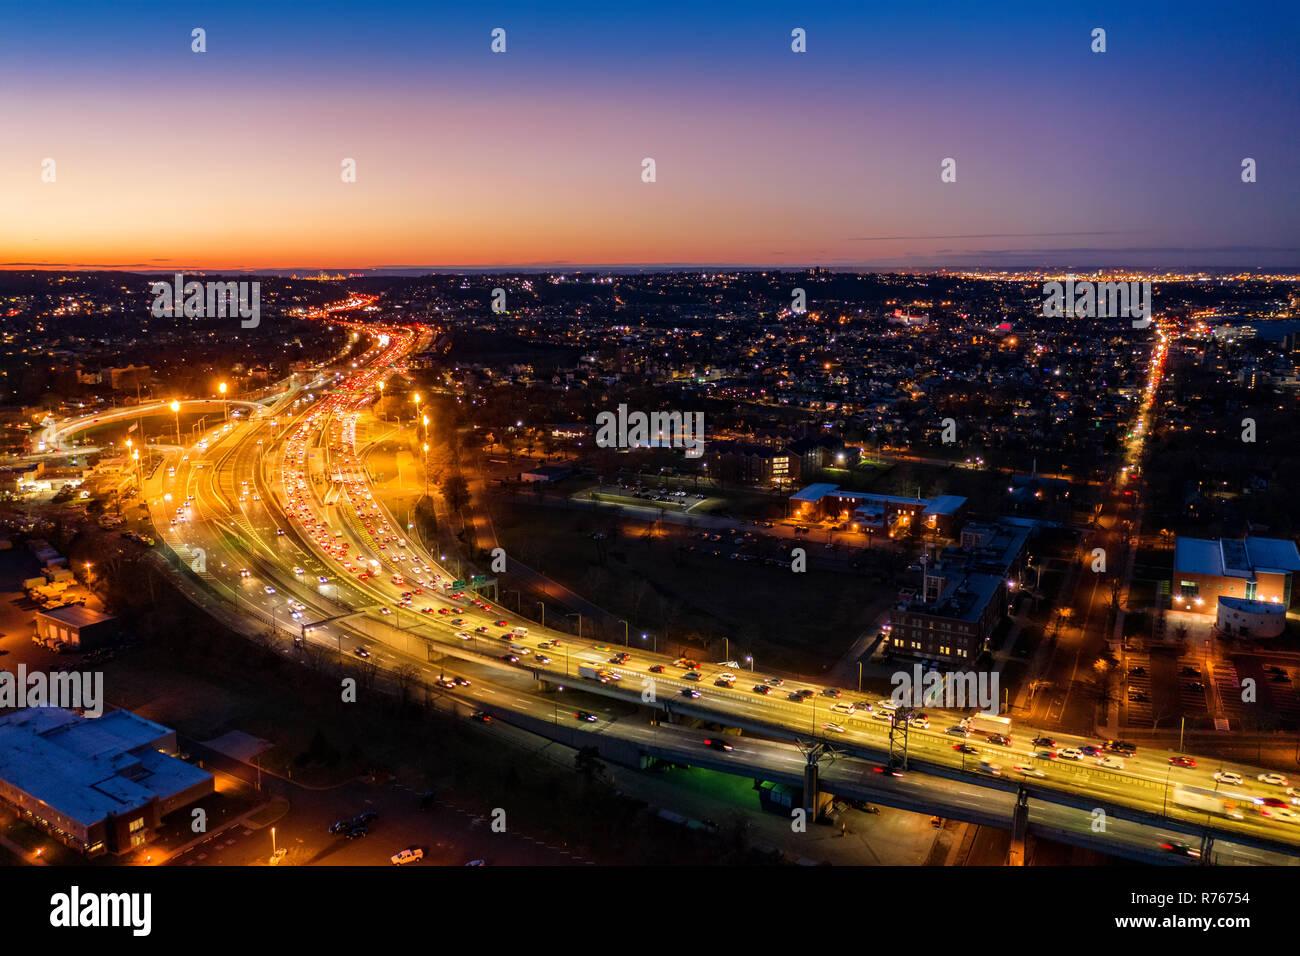 Aerial view of Staten Island Expressway - Stock Image